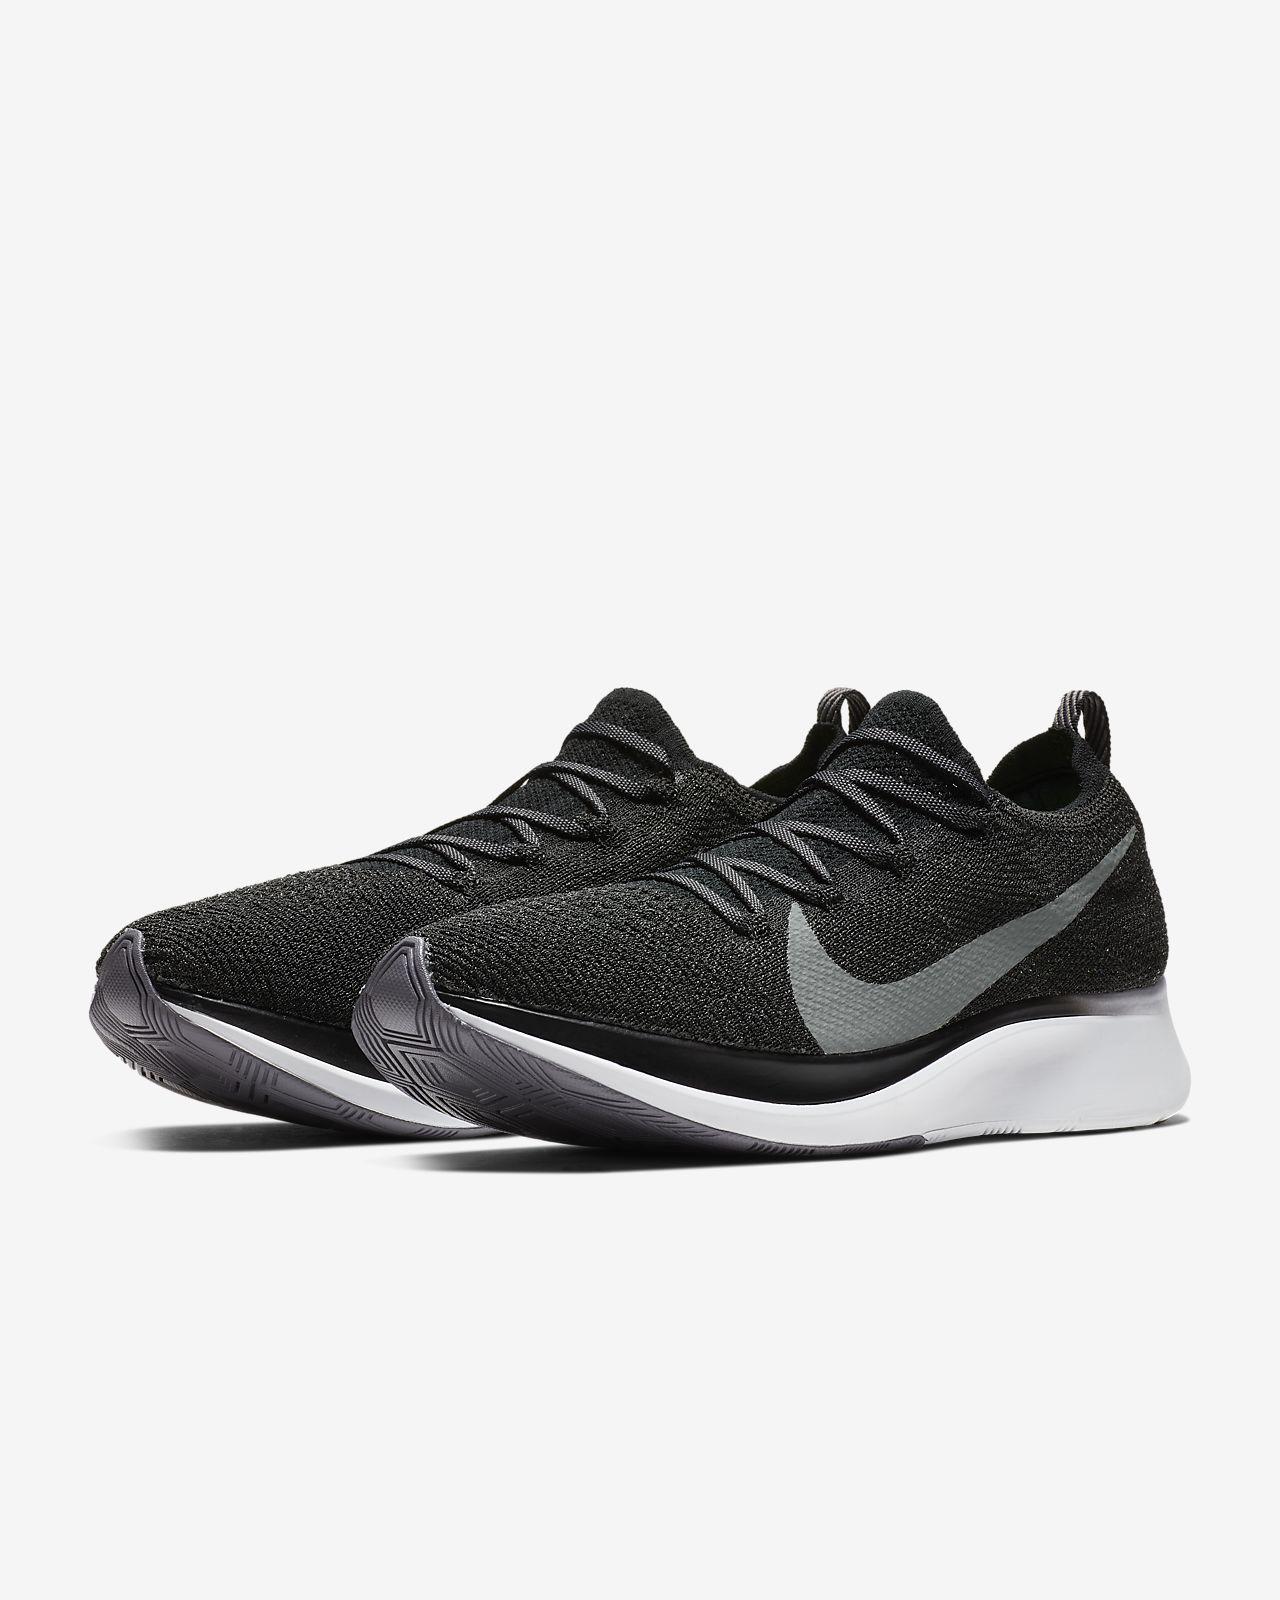 Tenis Nike Kyrie 4 Day Of The Dead Original Na Caixa R